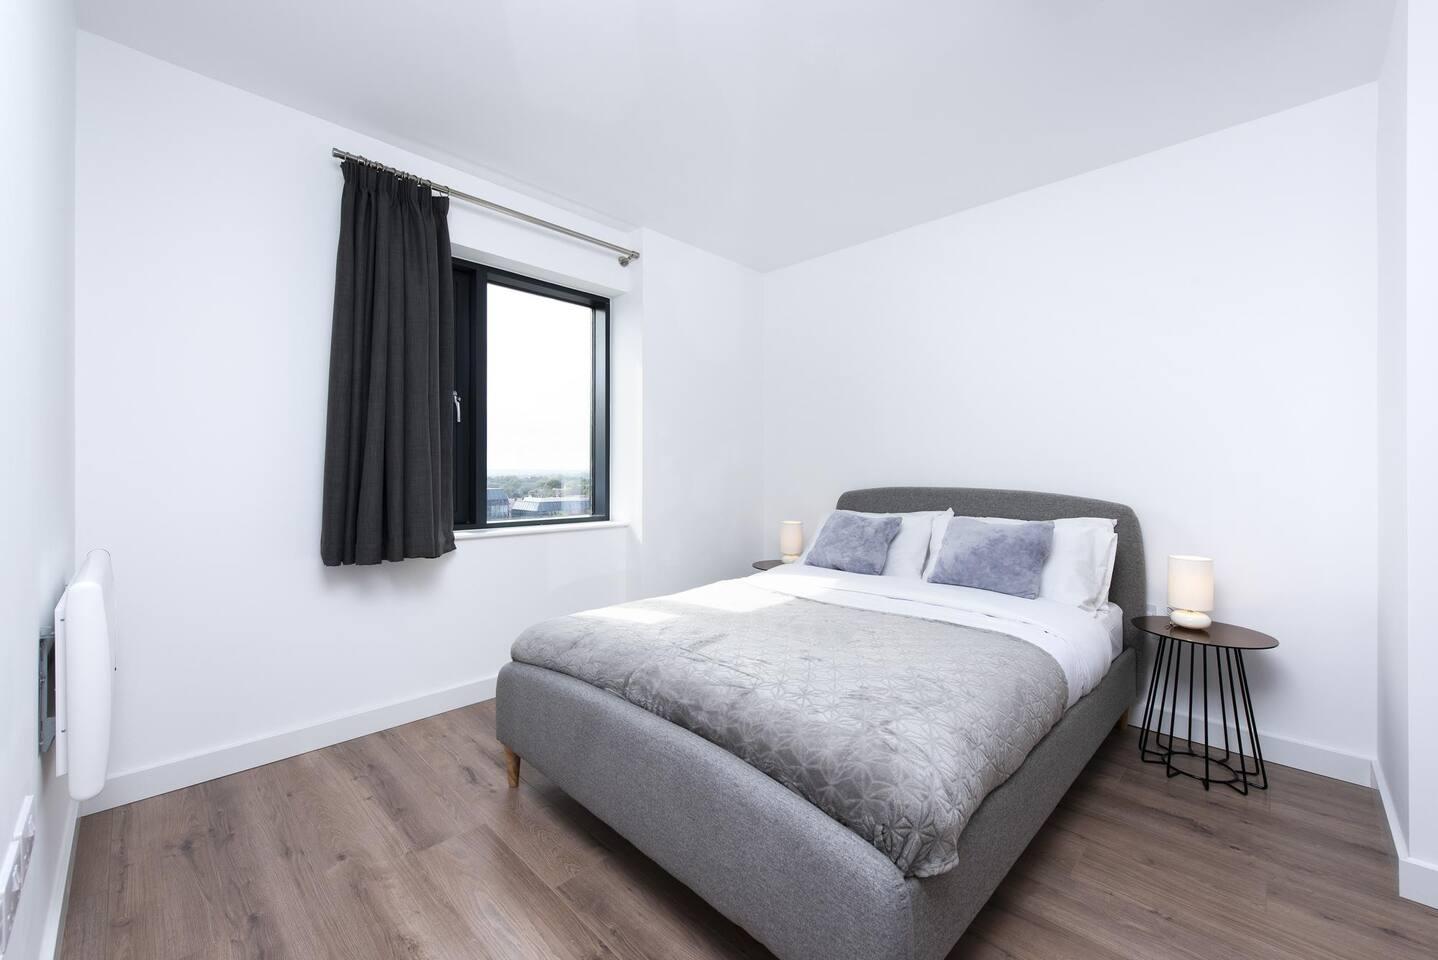 Bedroom at The Lansdowne Apartments, Ladywood, Birmingham